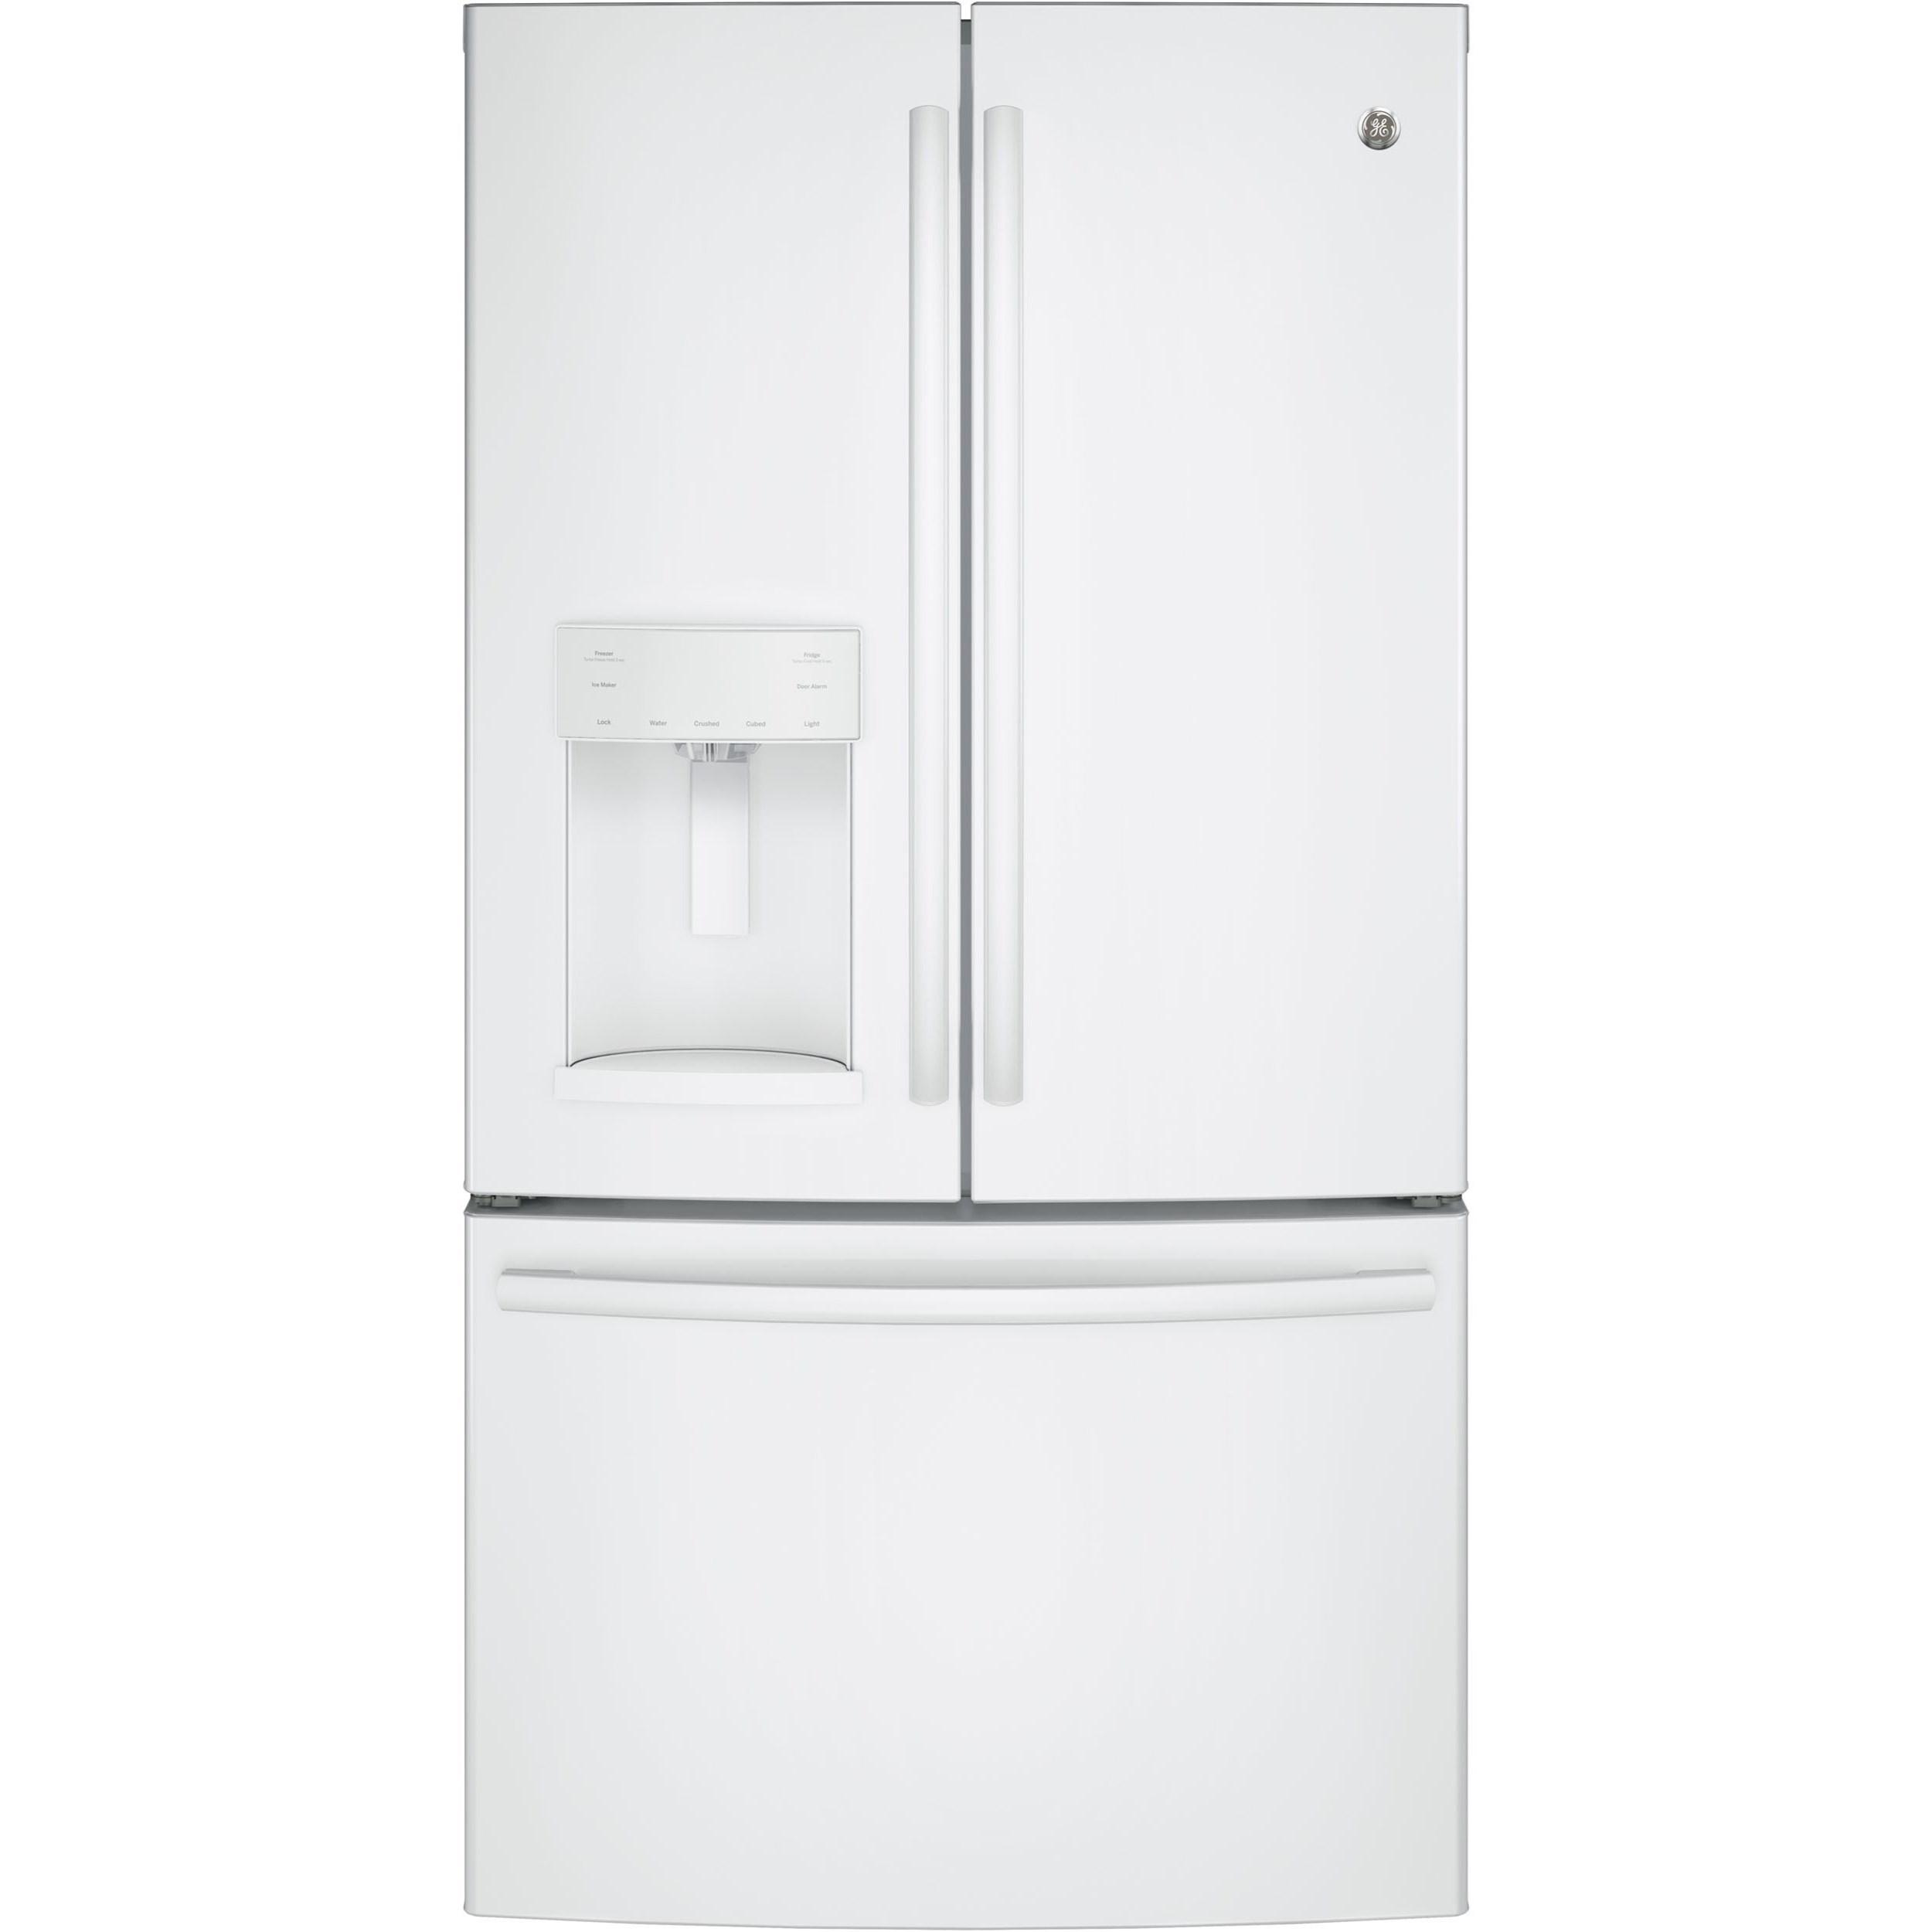 Ge Appliances Ge Series Energy Star 258 Cu Ft French Door